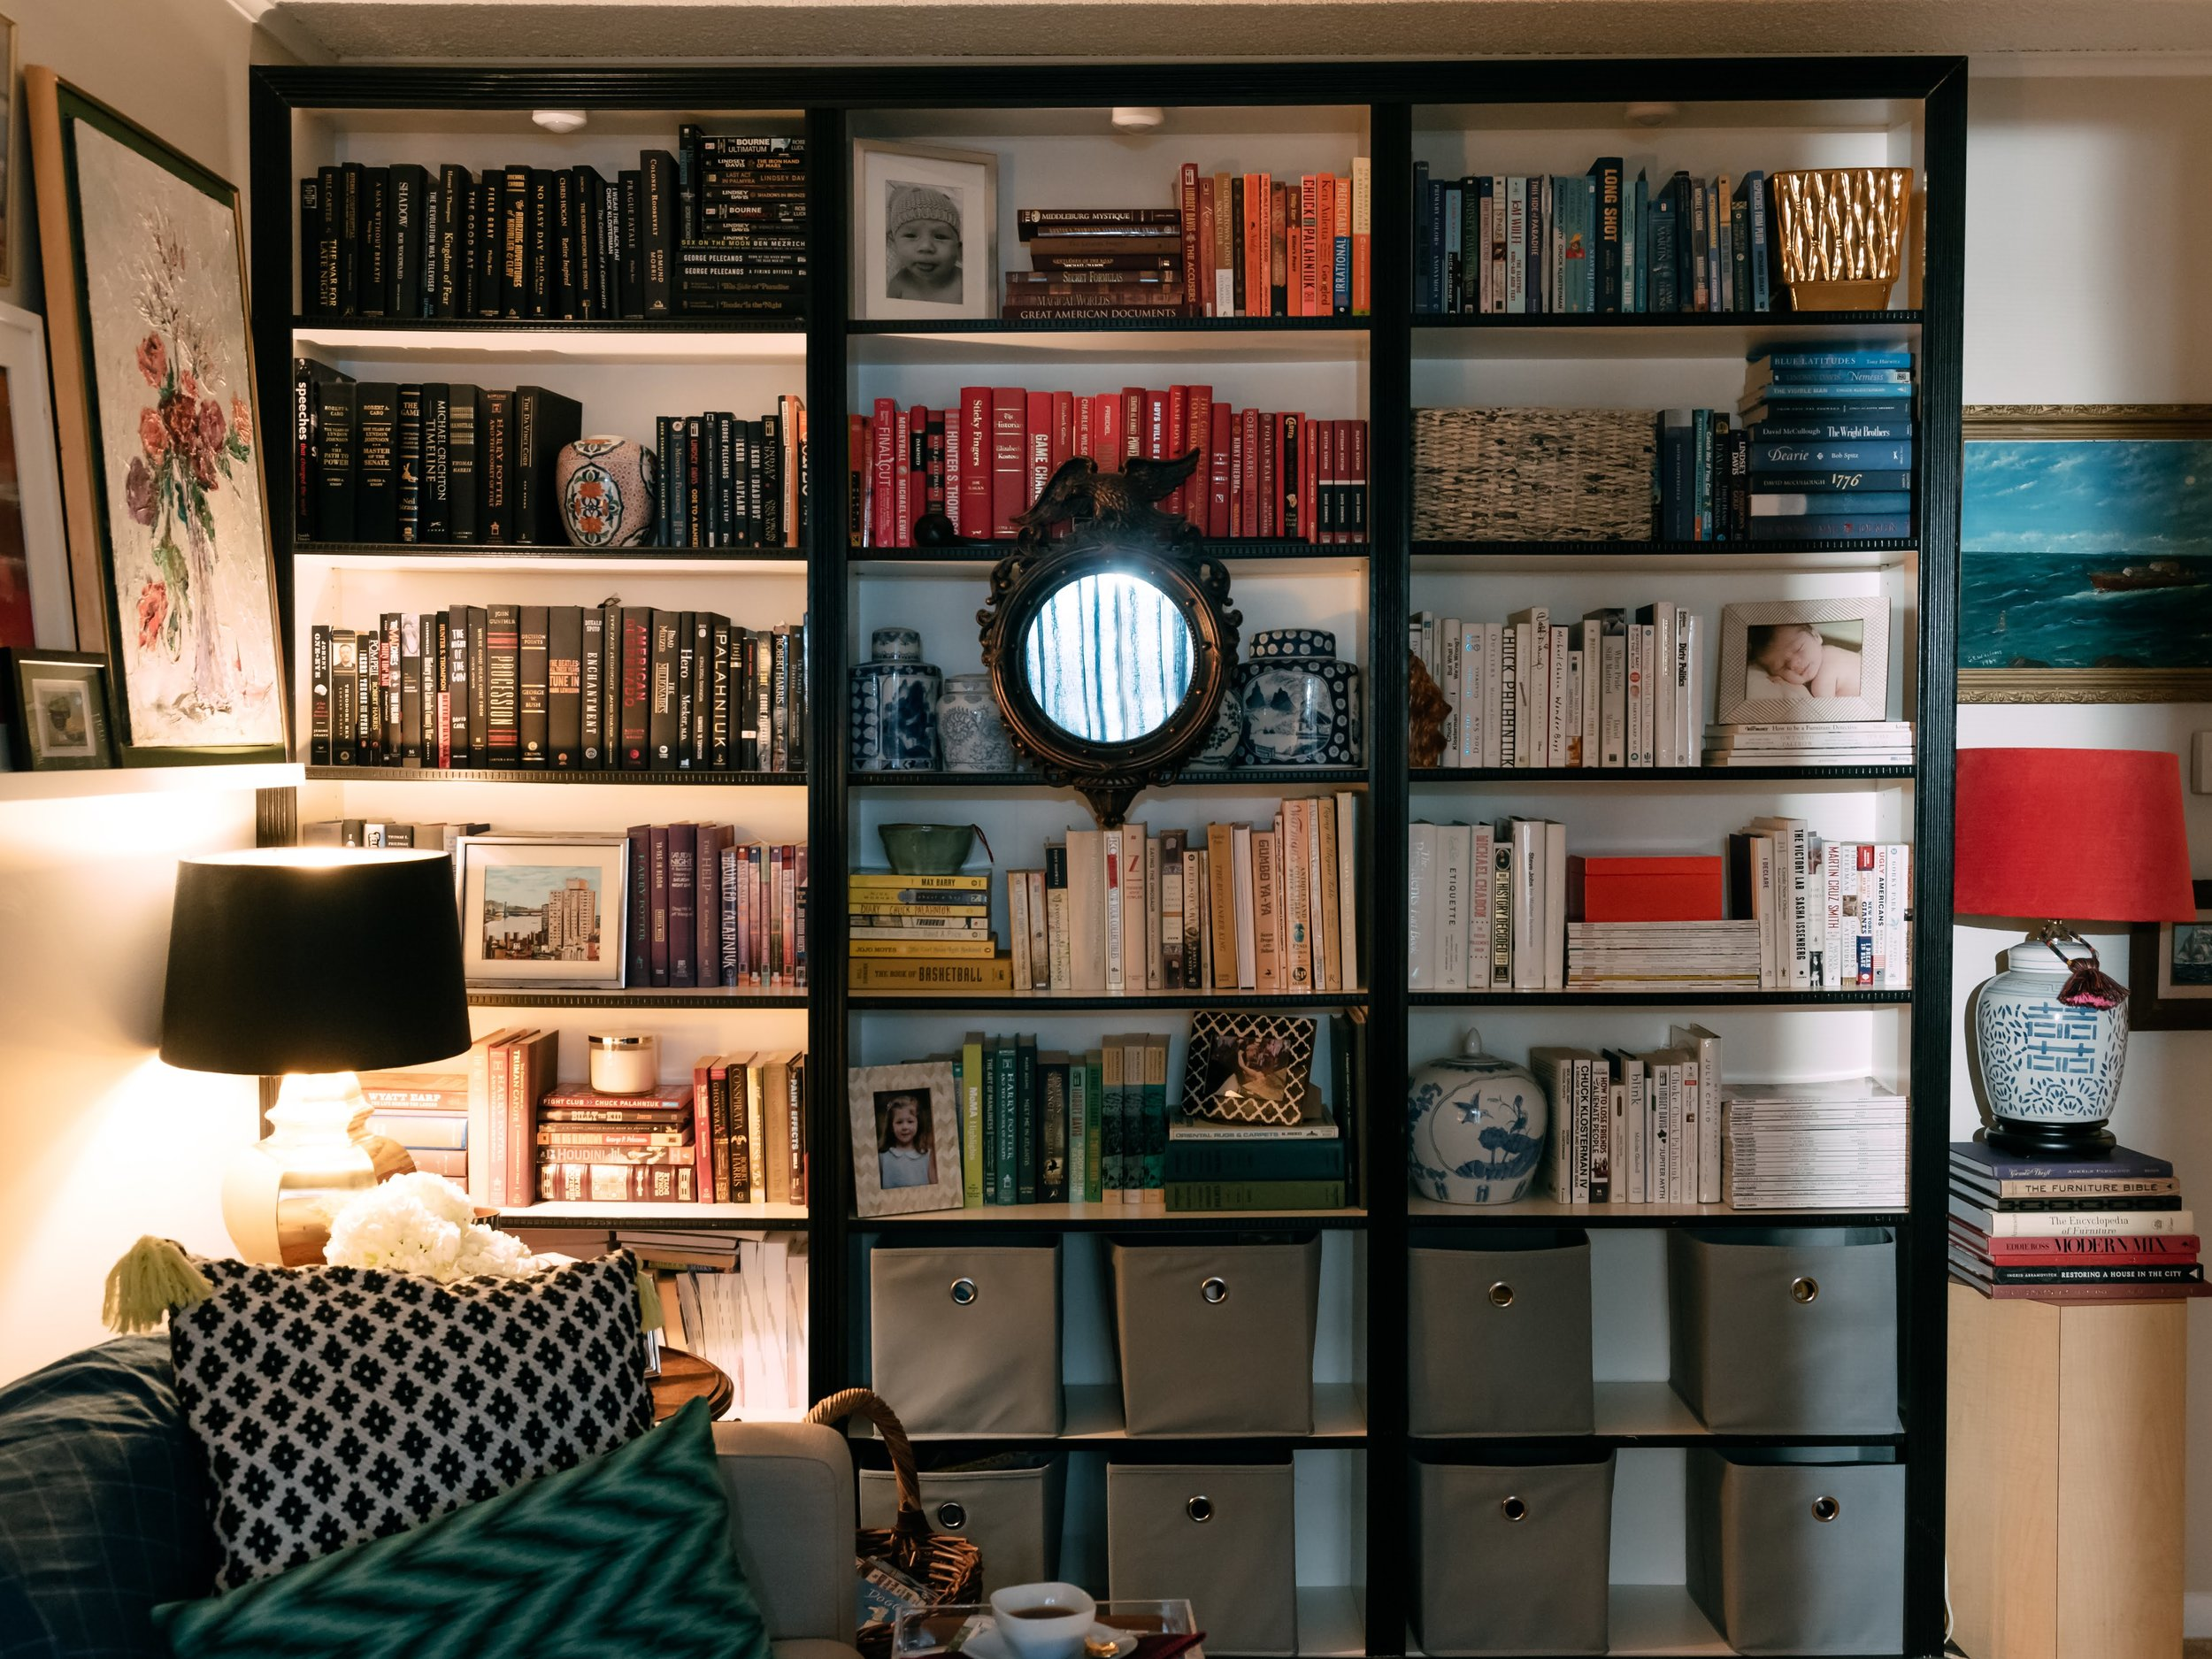 How do you like your bookshelves?